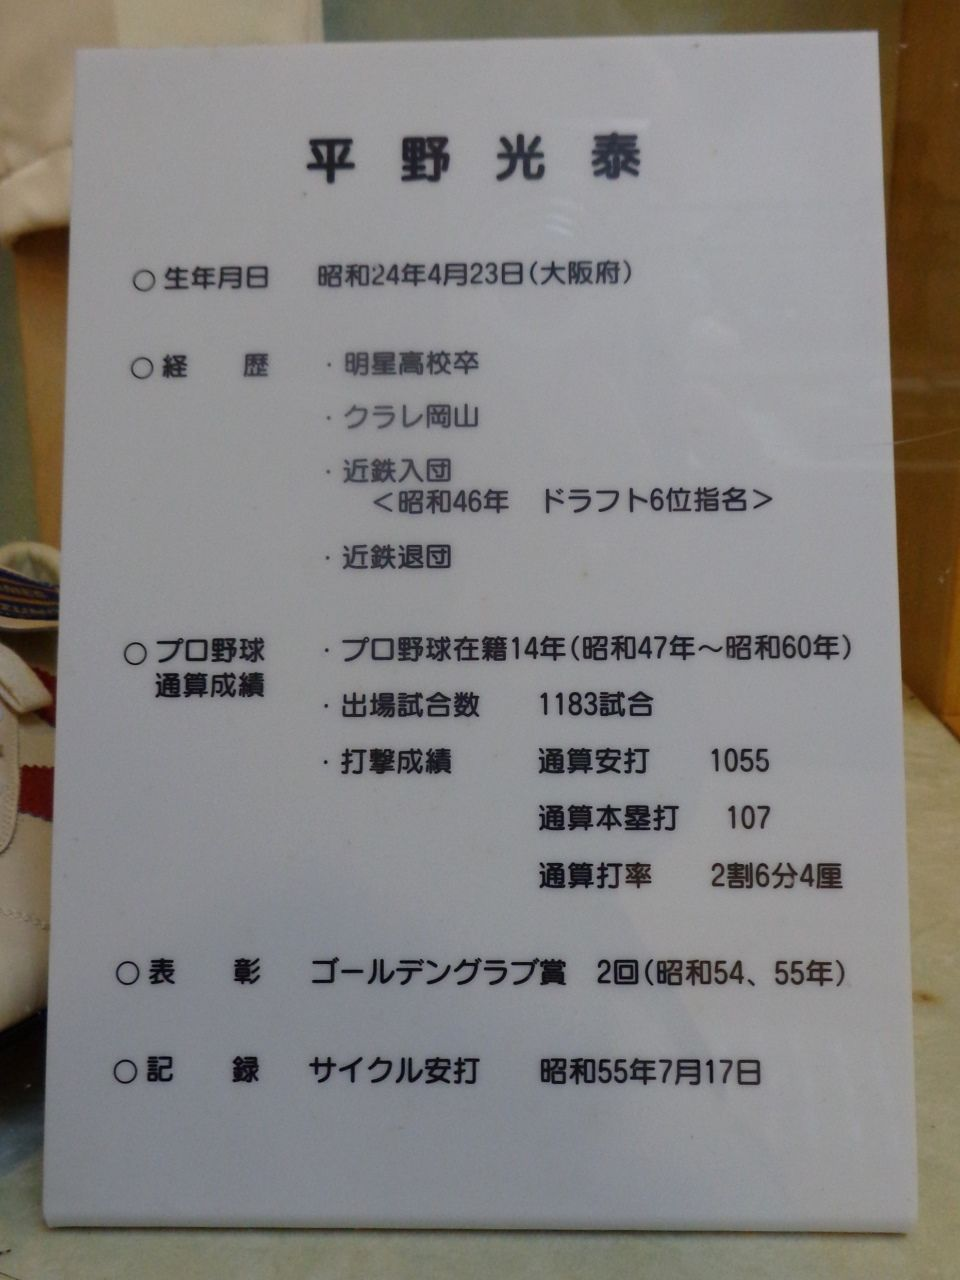 佐々木誠 (野球)の画像 p1_25